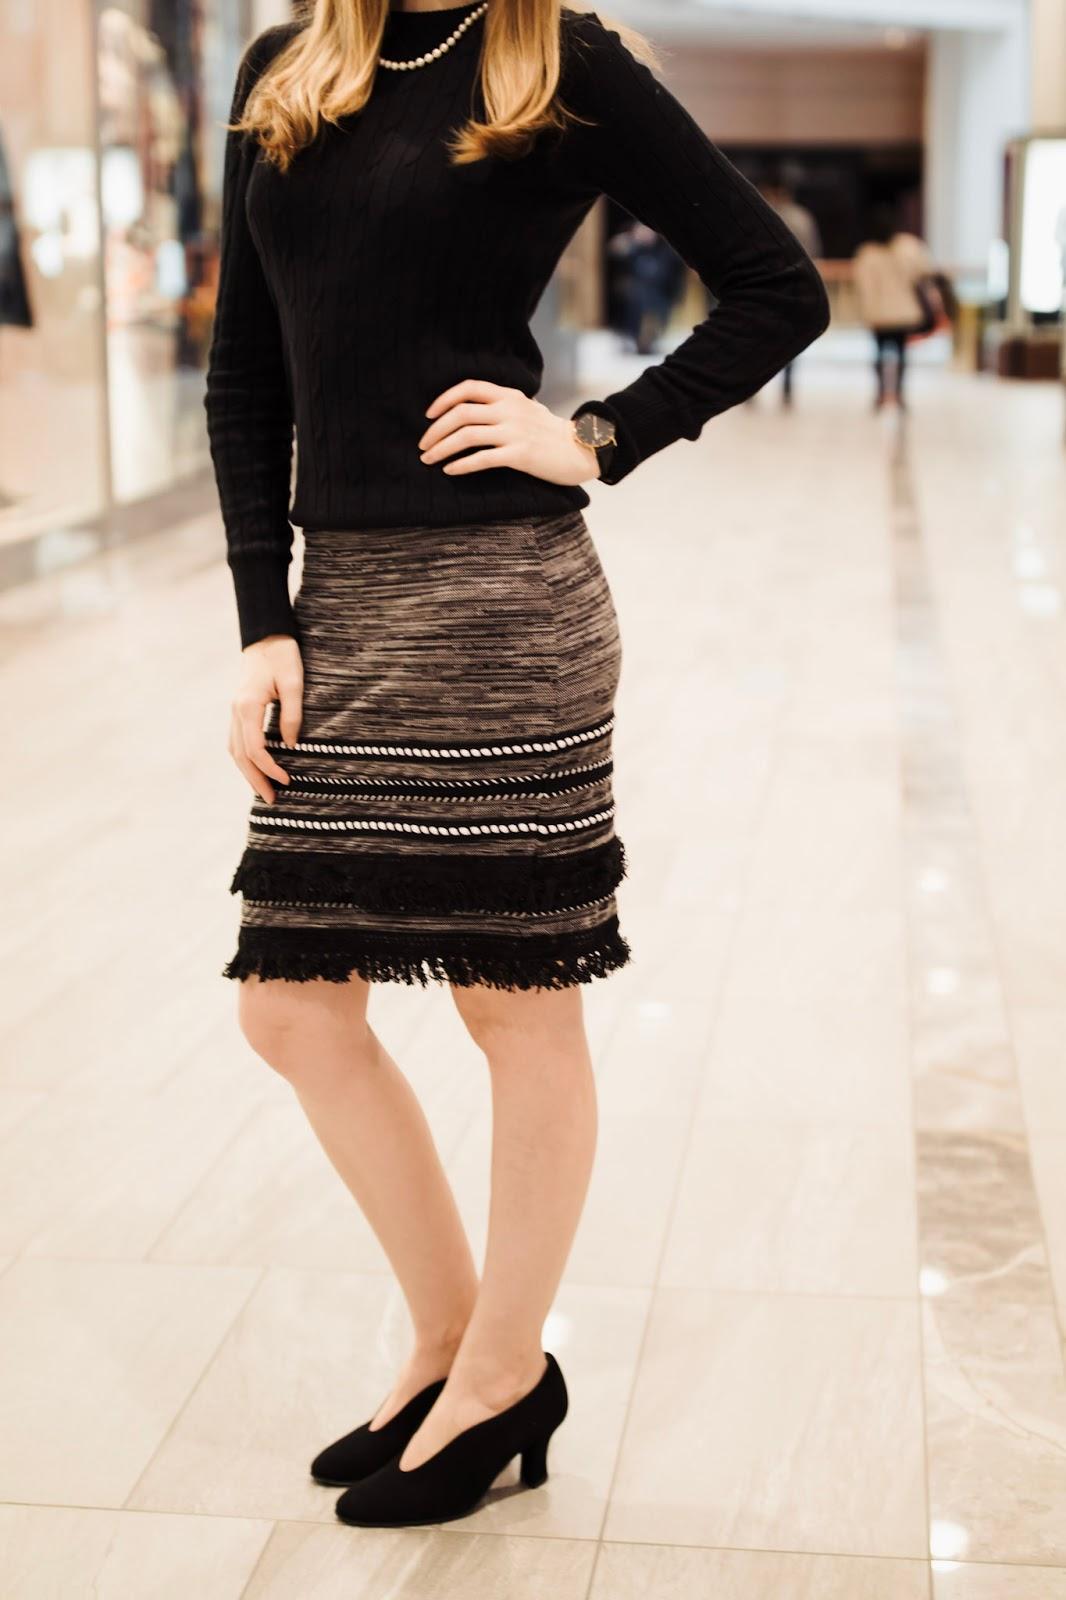 Thierry-Rabotin-shoes-make-me-chic-fringe-skirt